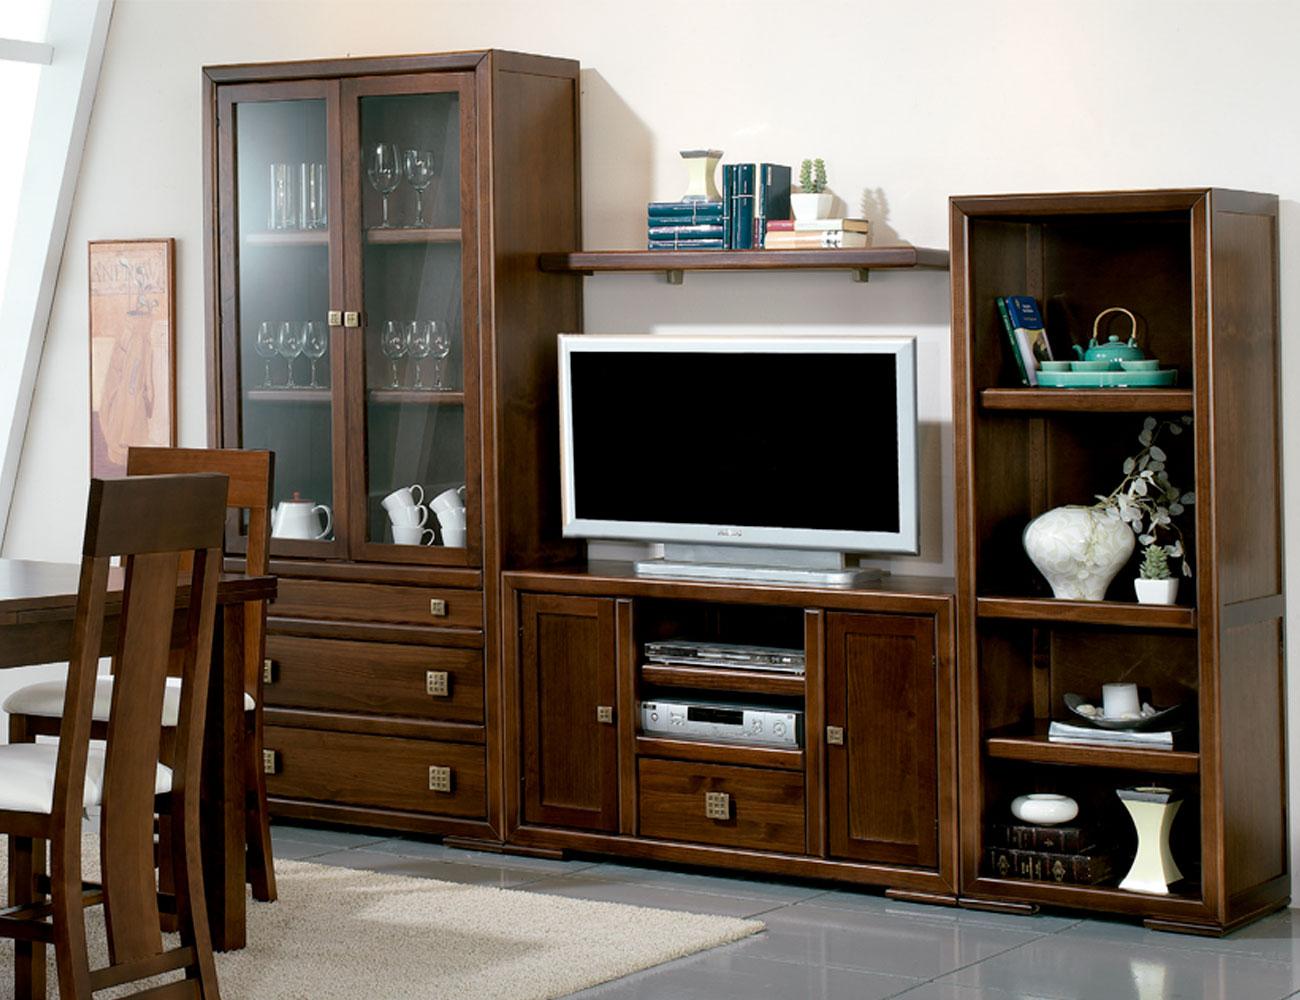 Composicion12 mueble salon comedor4